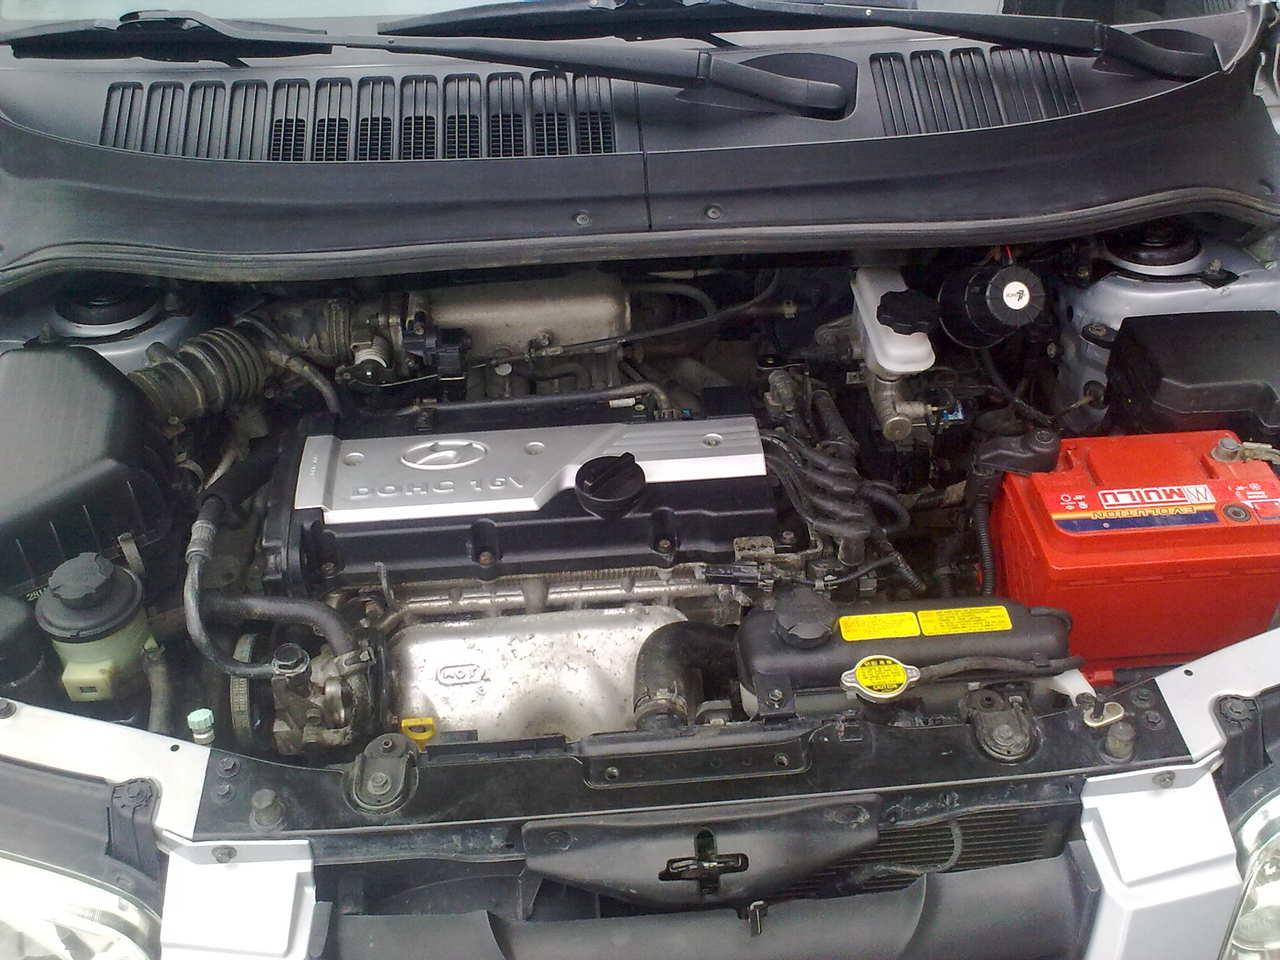 Saab 9 3 Turbo Engine Diagram further Chevy 5 3 Sensor Location as well Vw Jetta Vacuum Hose Diagram as well Saab 9 3 Turbo Engine Diagram in addition 2004 Hyundai Elantra Fuel Filter. on saab 2 0 engine diagram pcv get free image